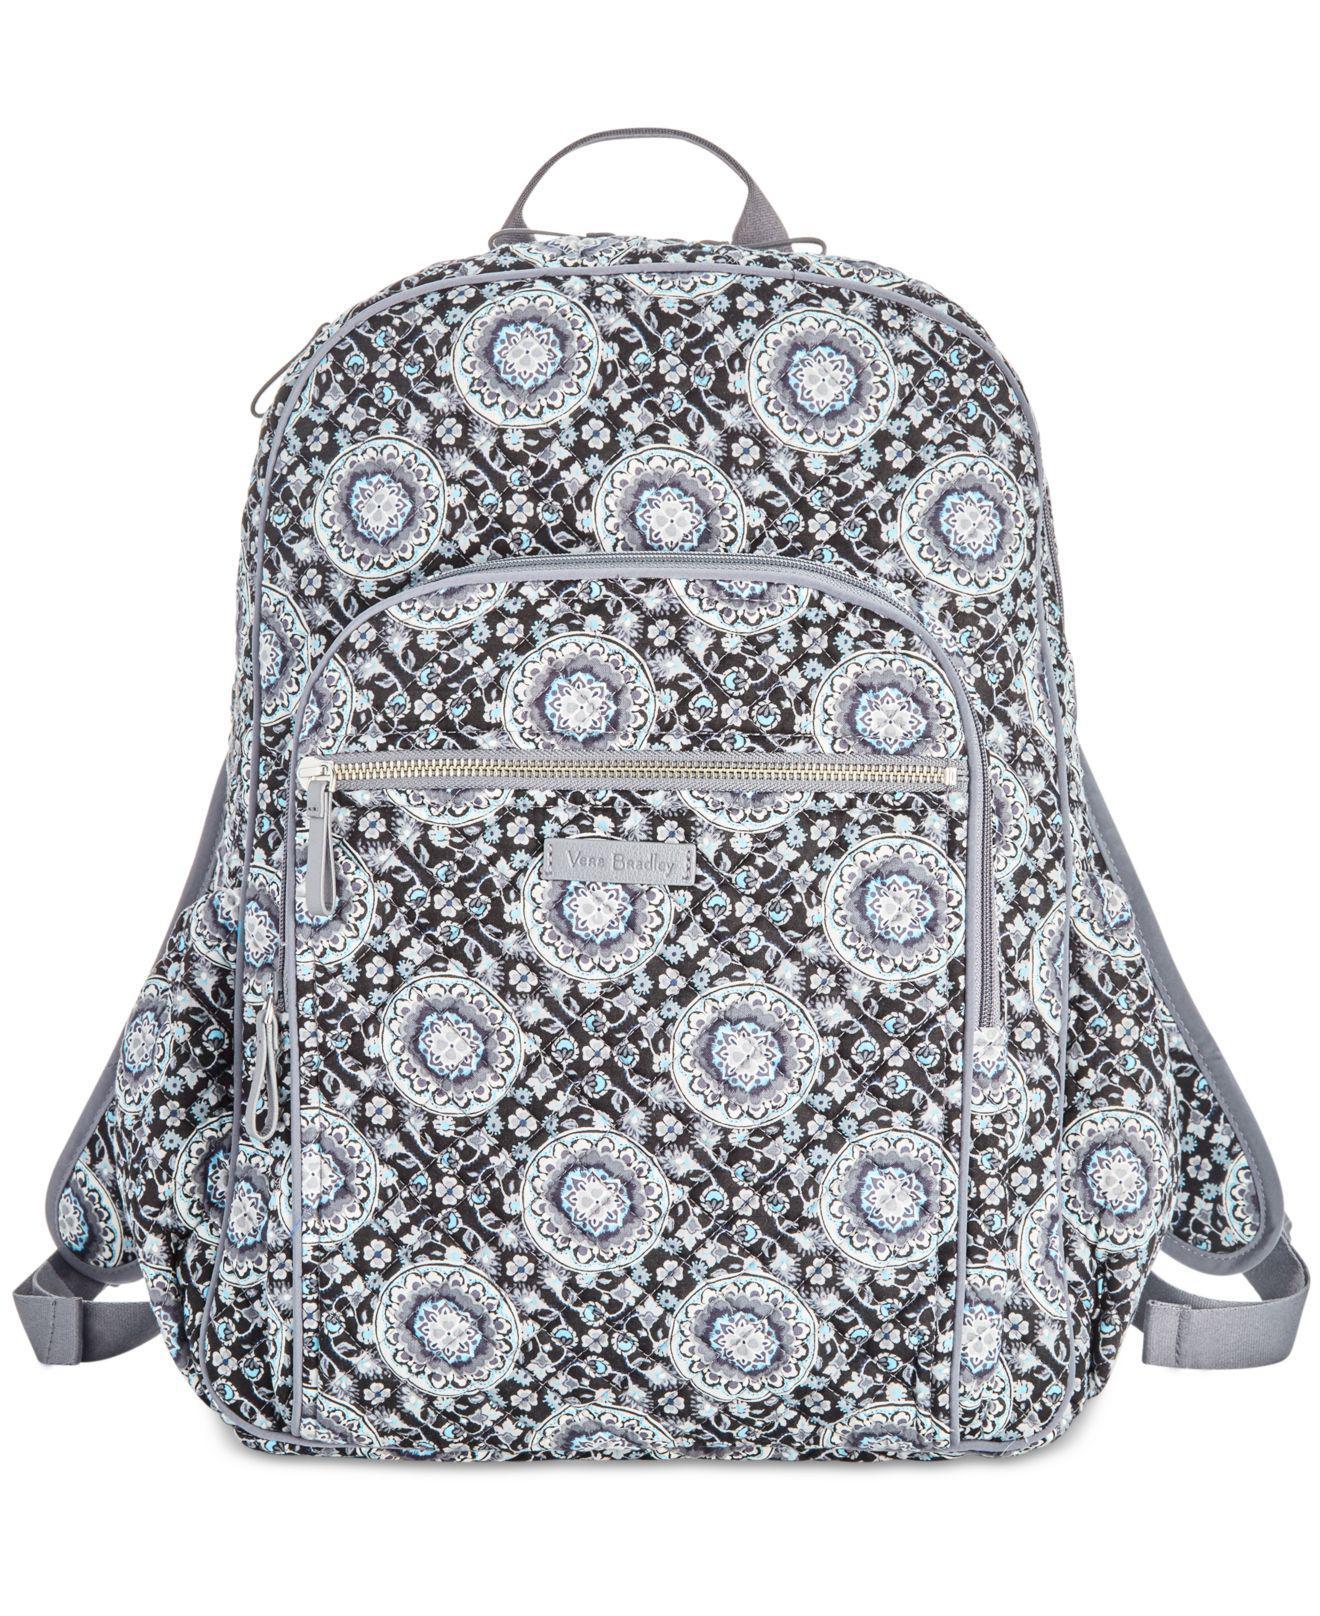 61d874e676ec Lyst - Vera Bradley Campus Tech Backpack in Gray